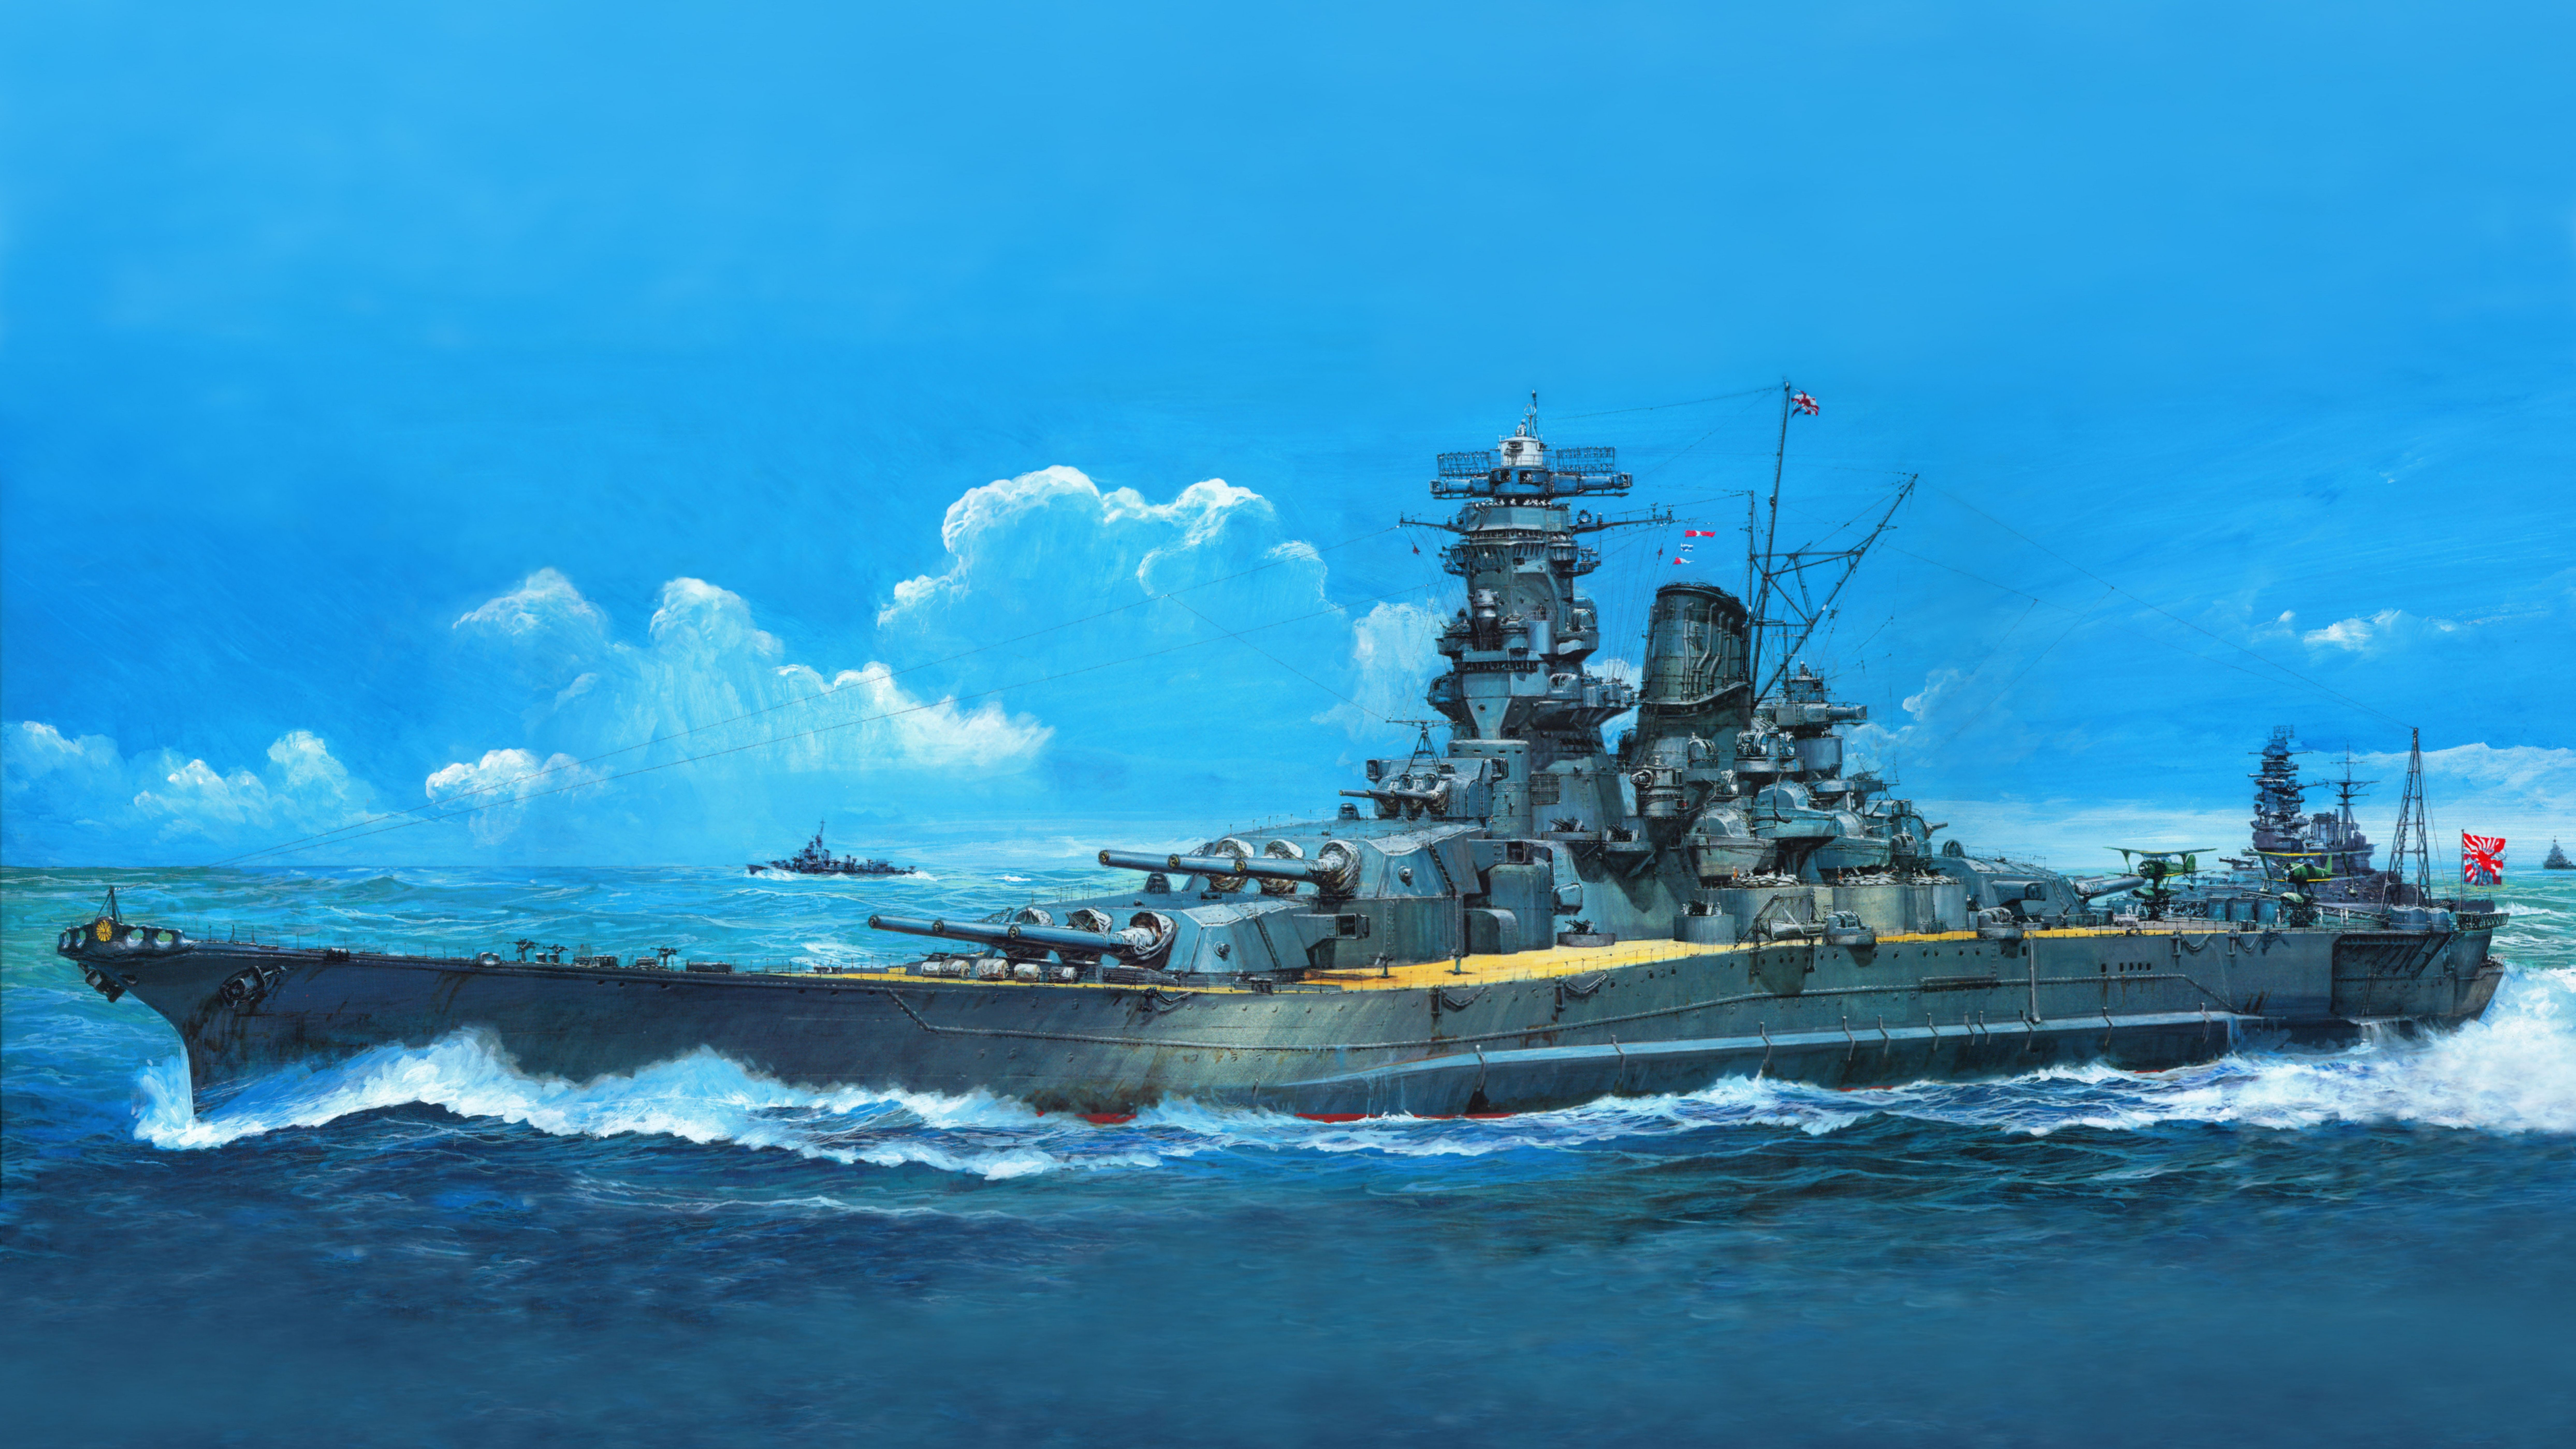 Battleship Wallpaper Phone Hqg Battleship Yamato Class